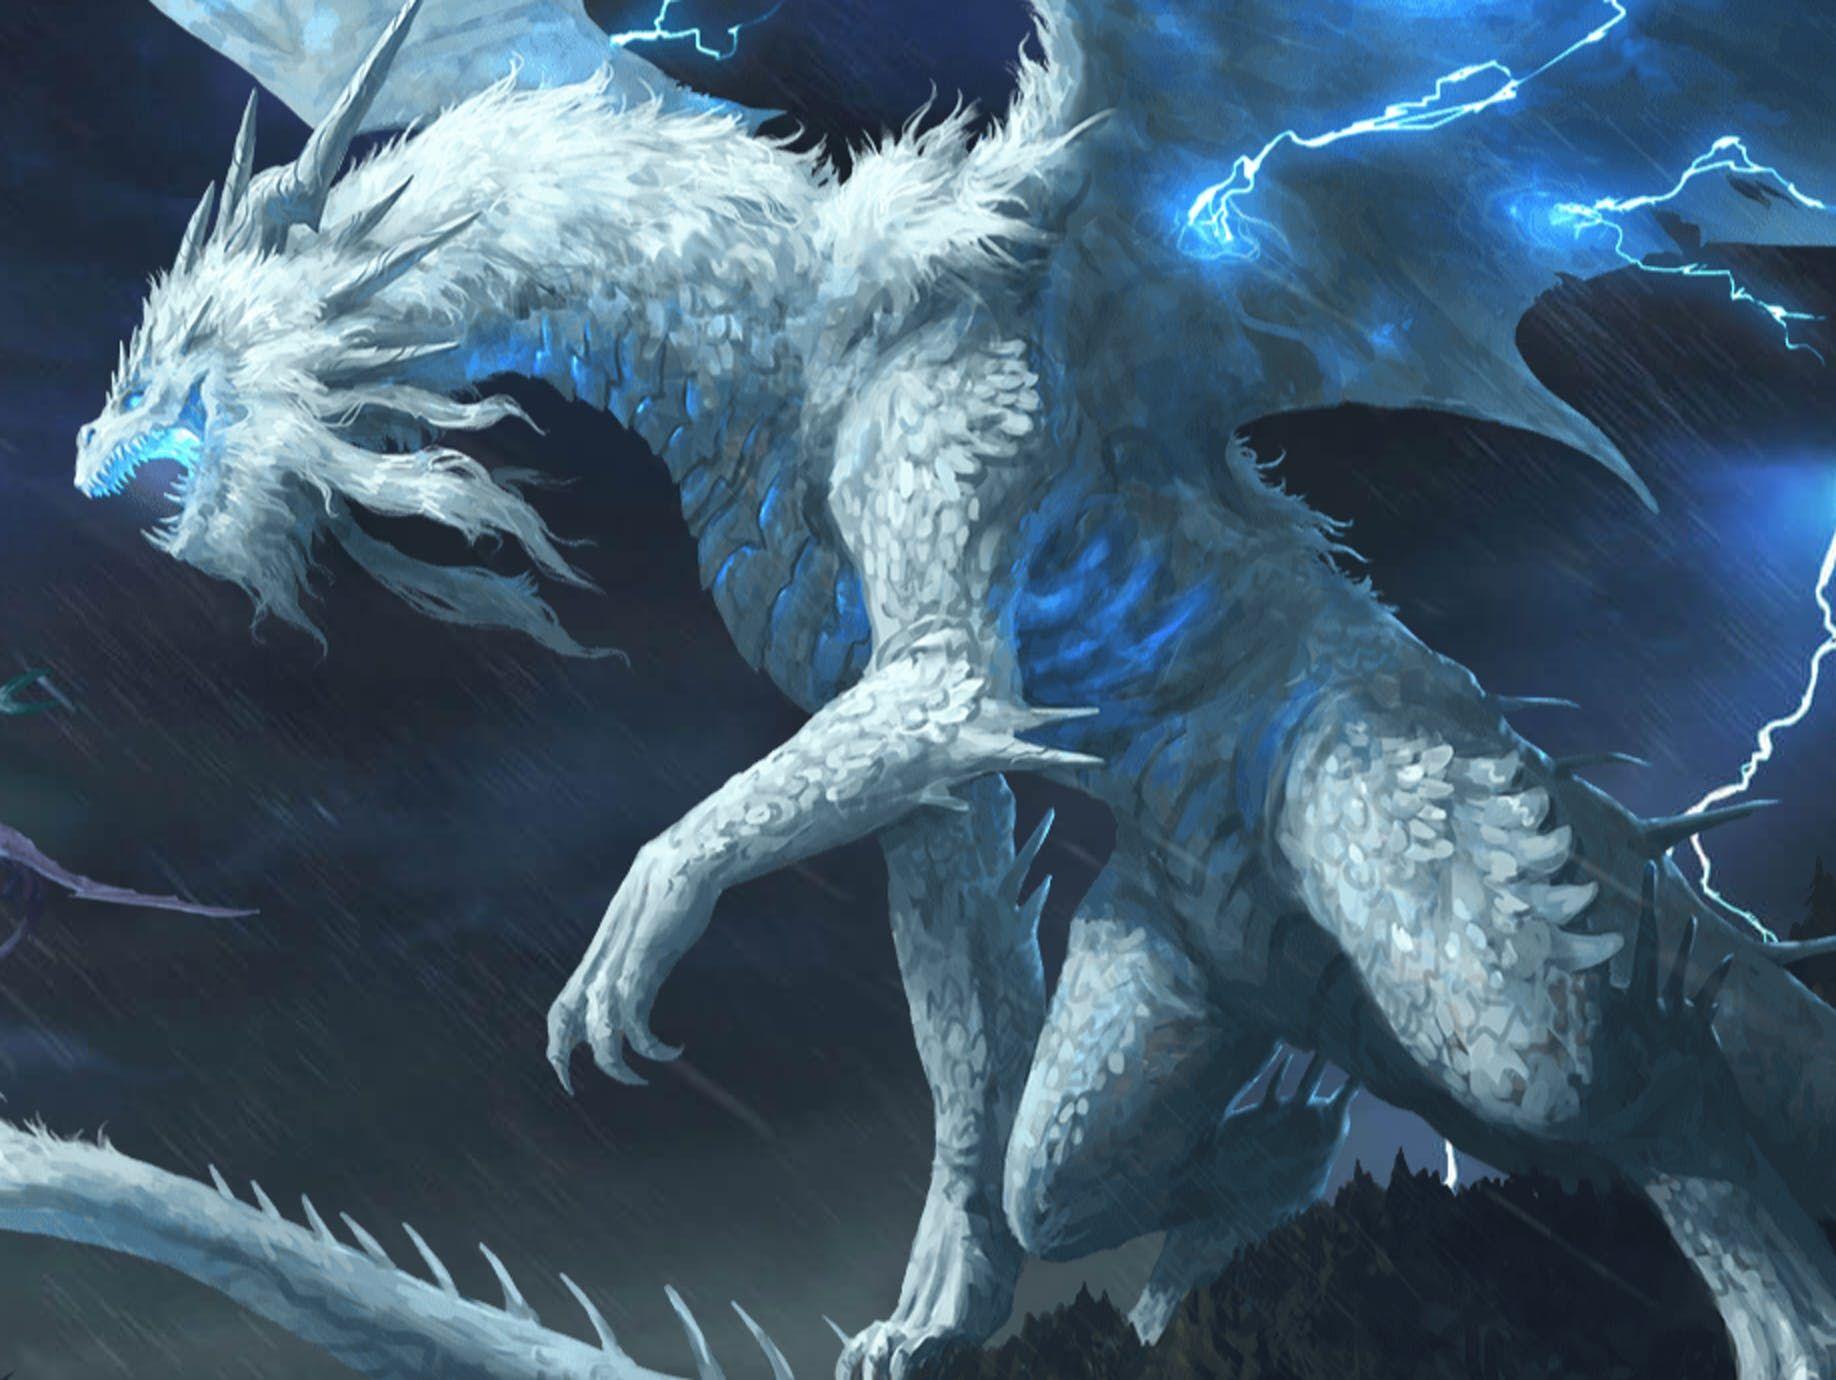 Dragonprince Fantasy Dragon Avatar Tv Netflix Digitalart Dragons Lightning Dragon Mythical Creatures Art Dragon Artwork